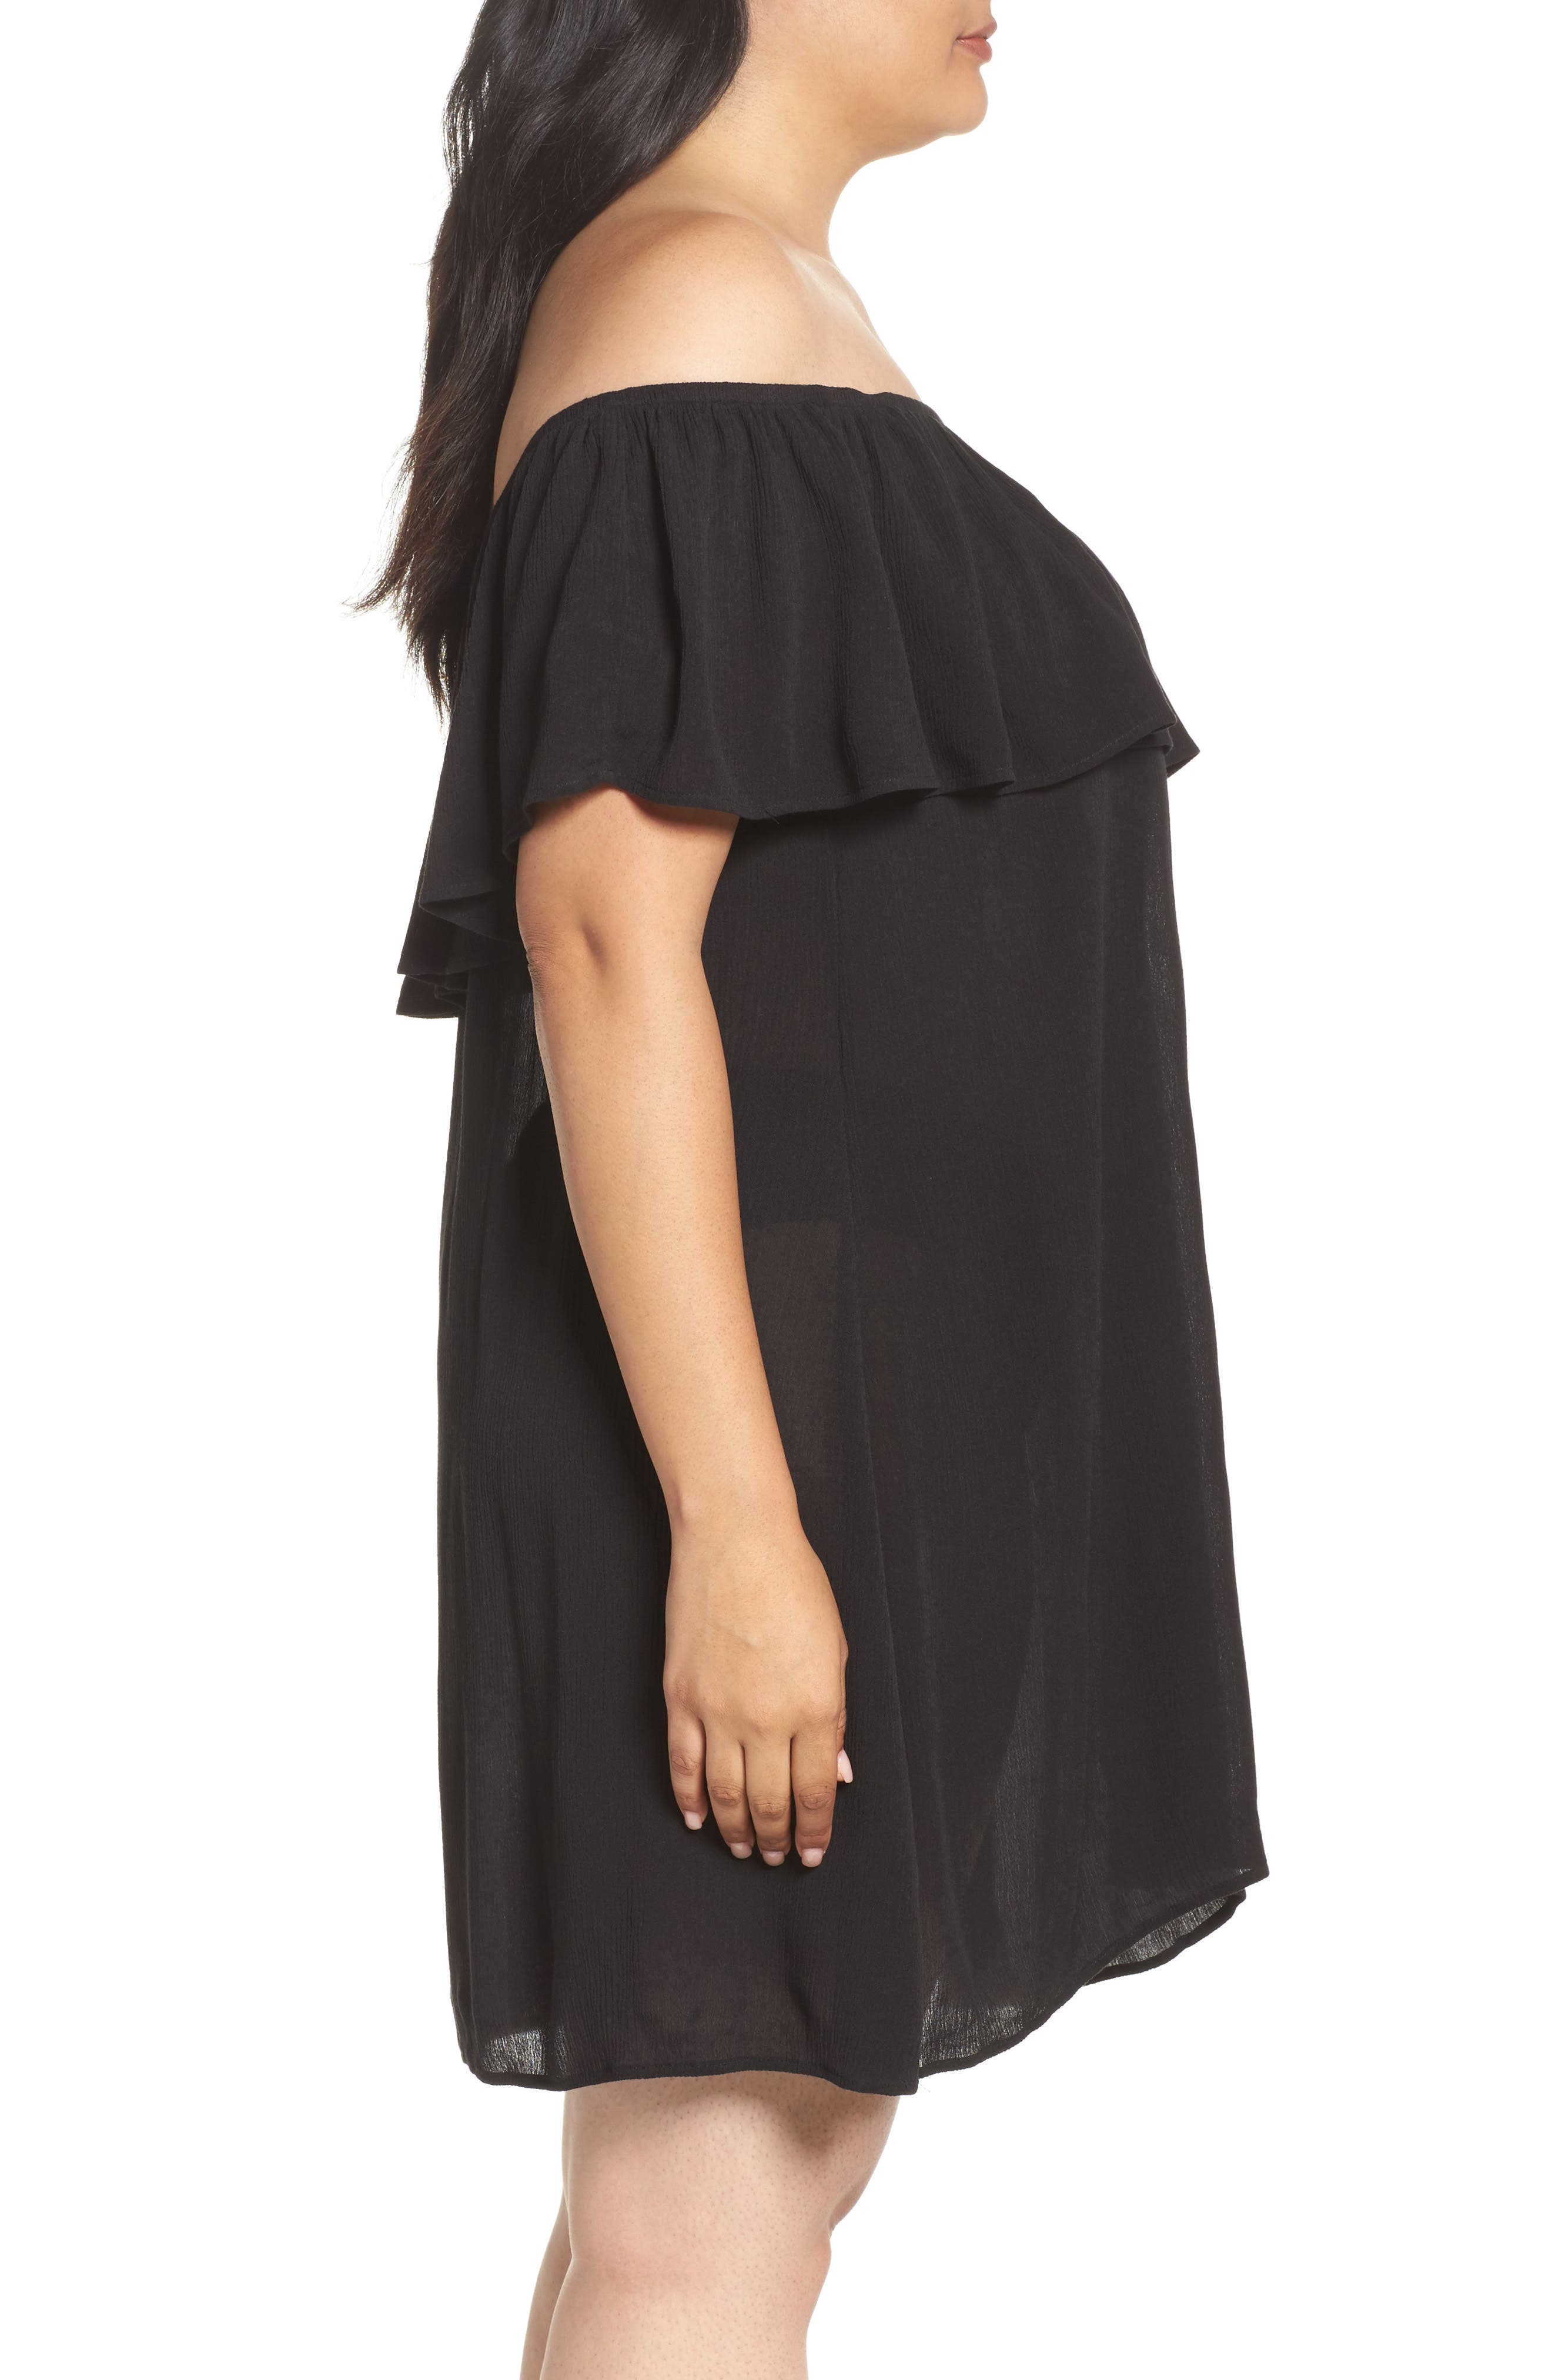 Southern Belle Off the Shoulder Cover-Up Dress,                             Alternate thumbnail 3, color,                             001